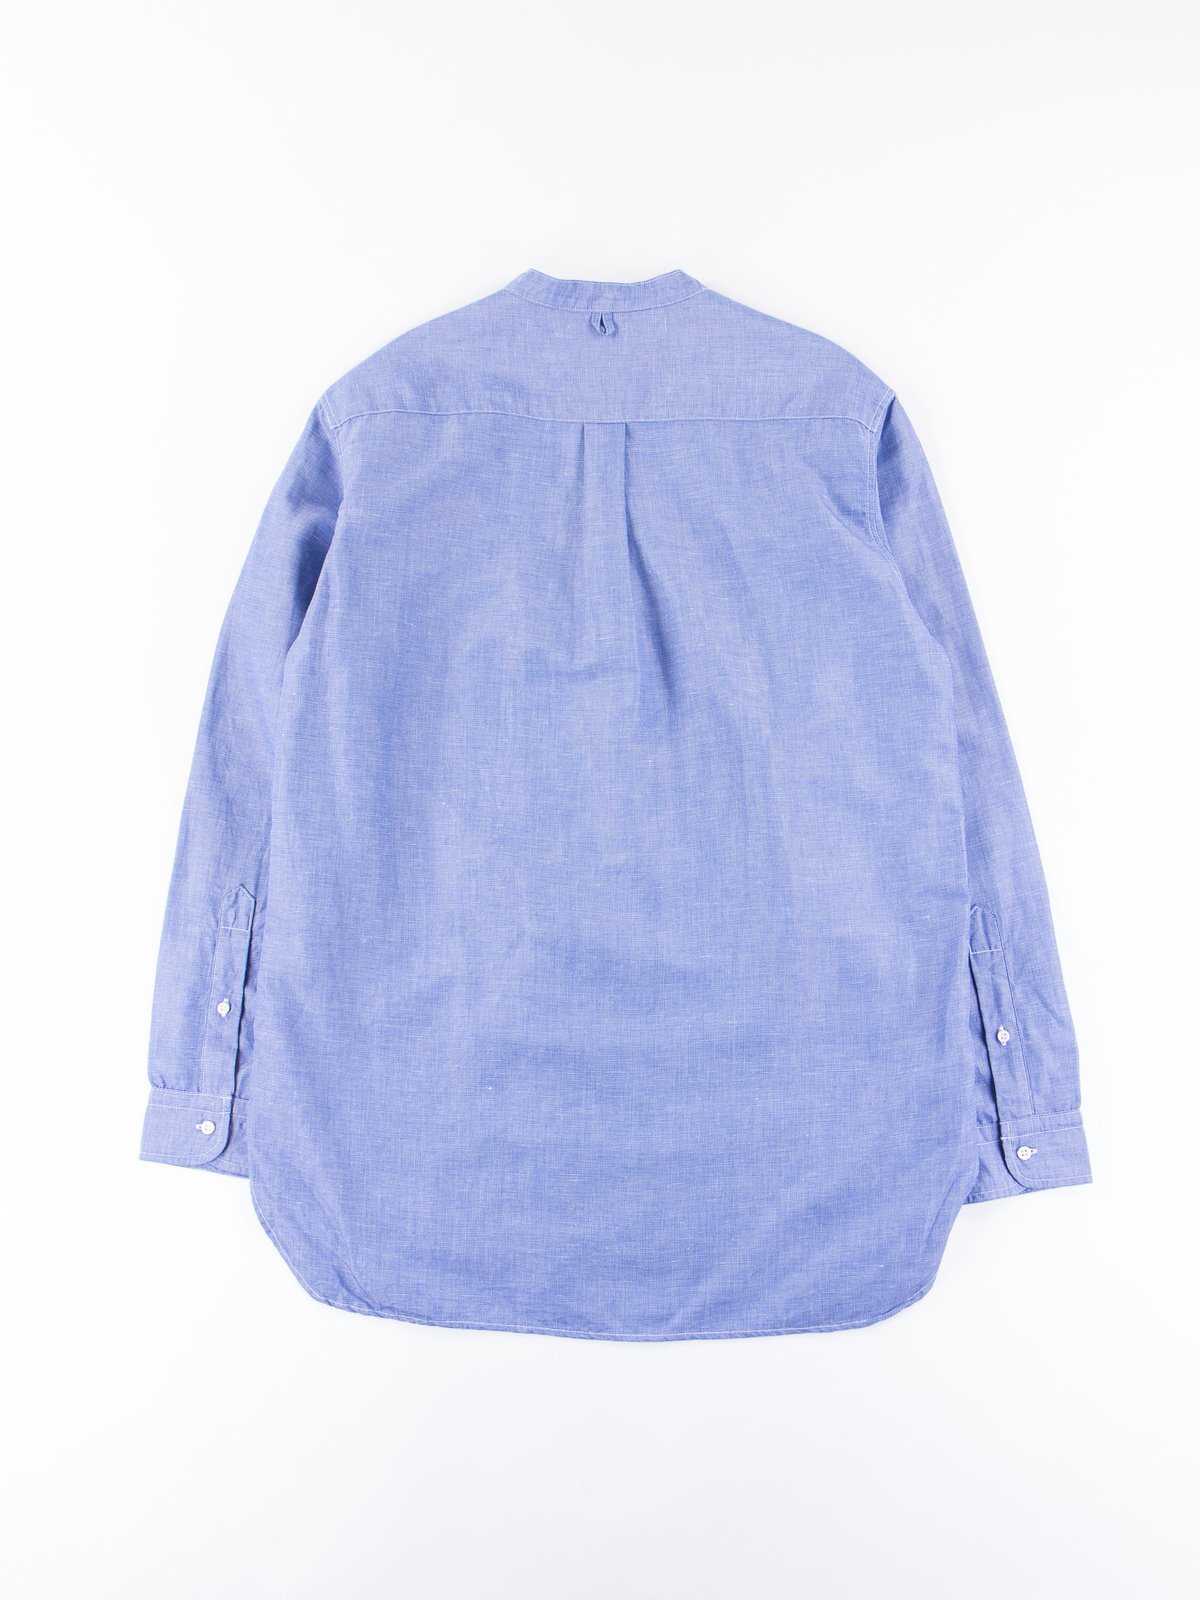 Blue End on End Banded Collar Shirt - Image 4